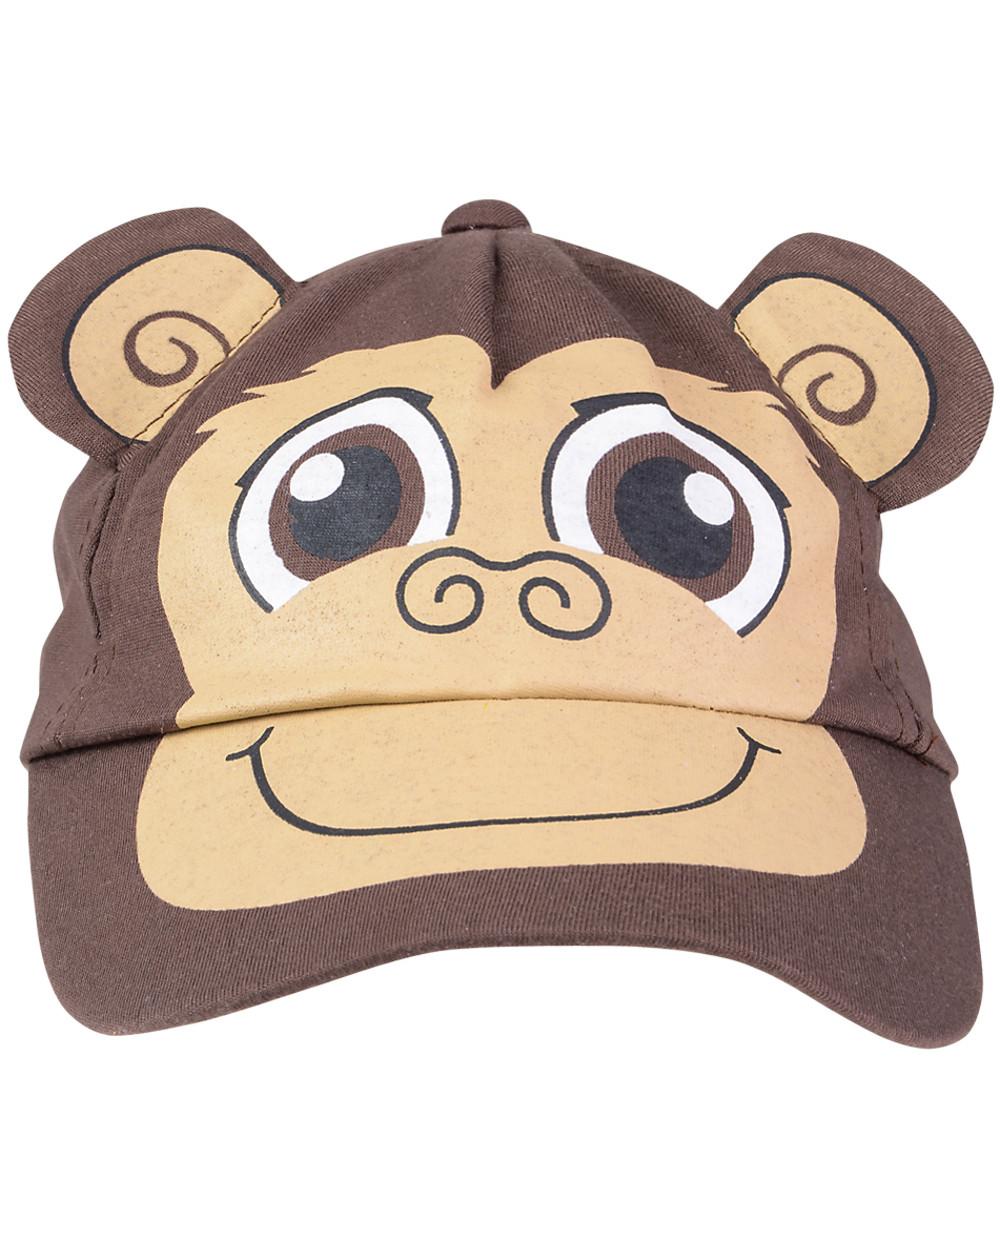 Adult's Brown Monkey Baseball Cap